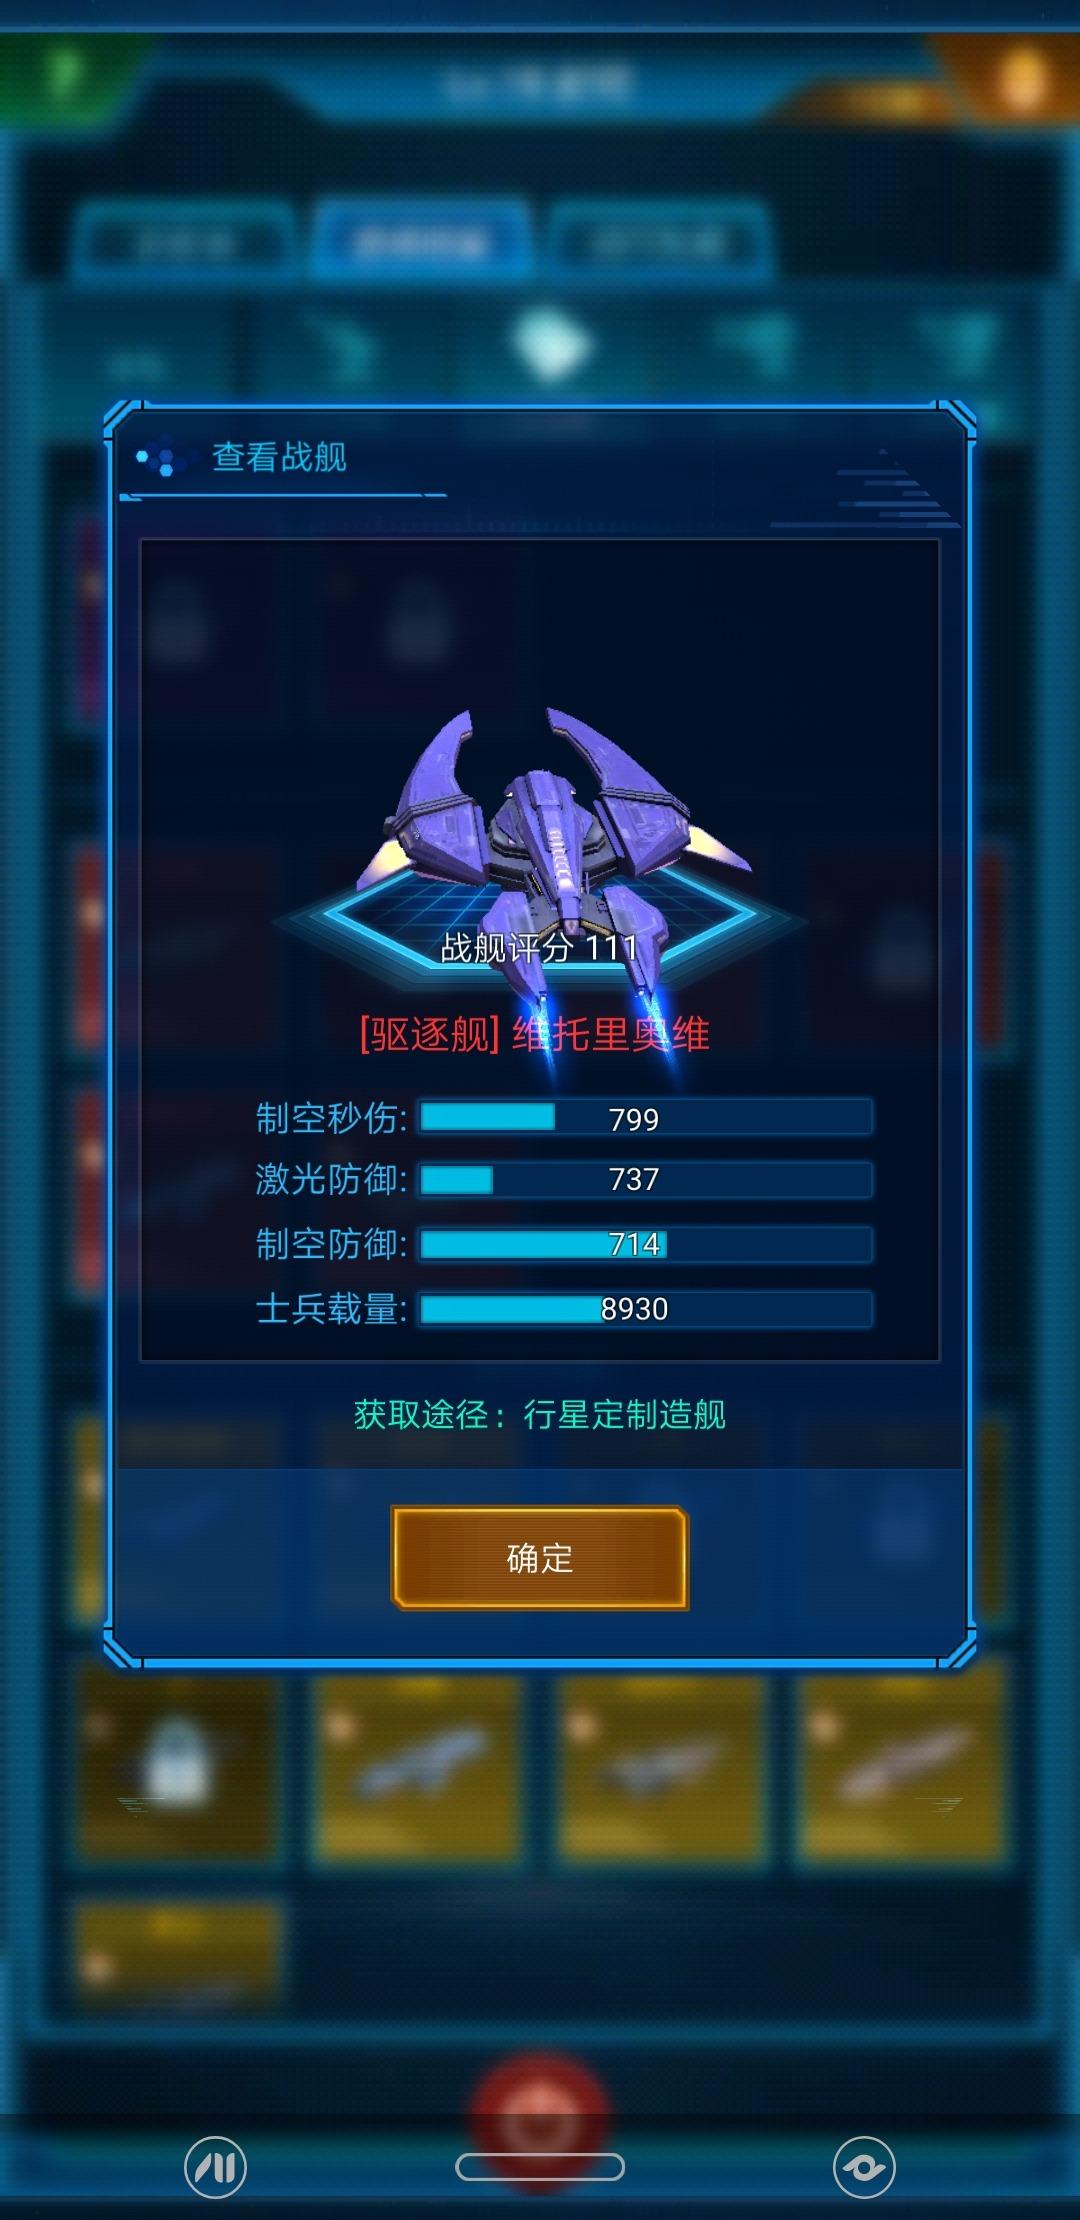 Screenshot_20190810_072113_com.jedigames.p16s.huawei.jpg